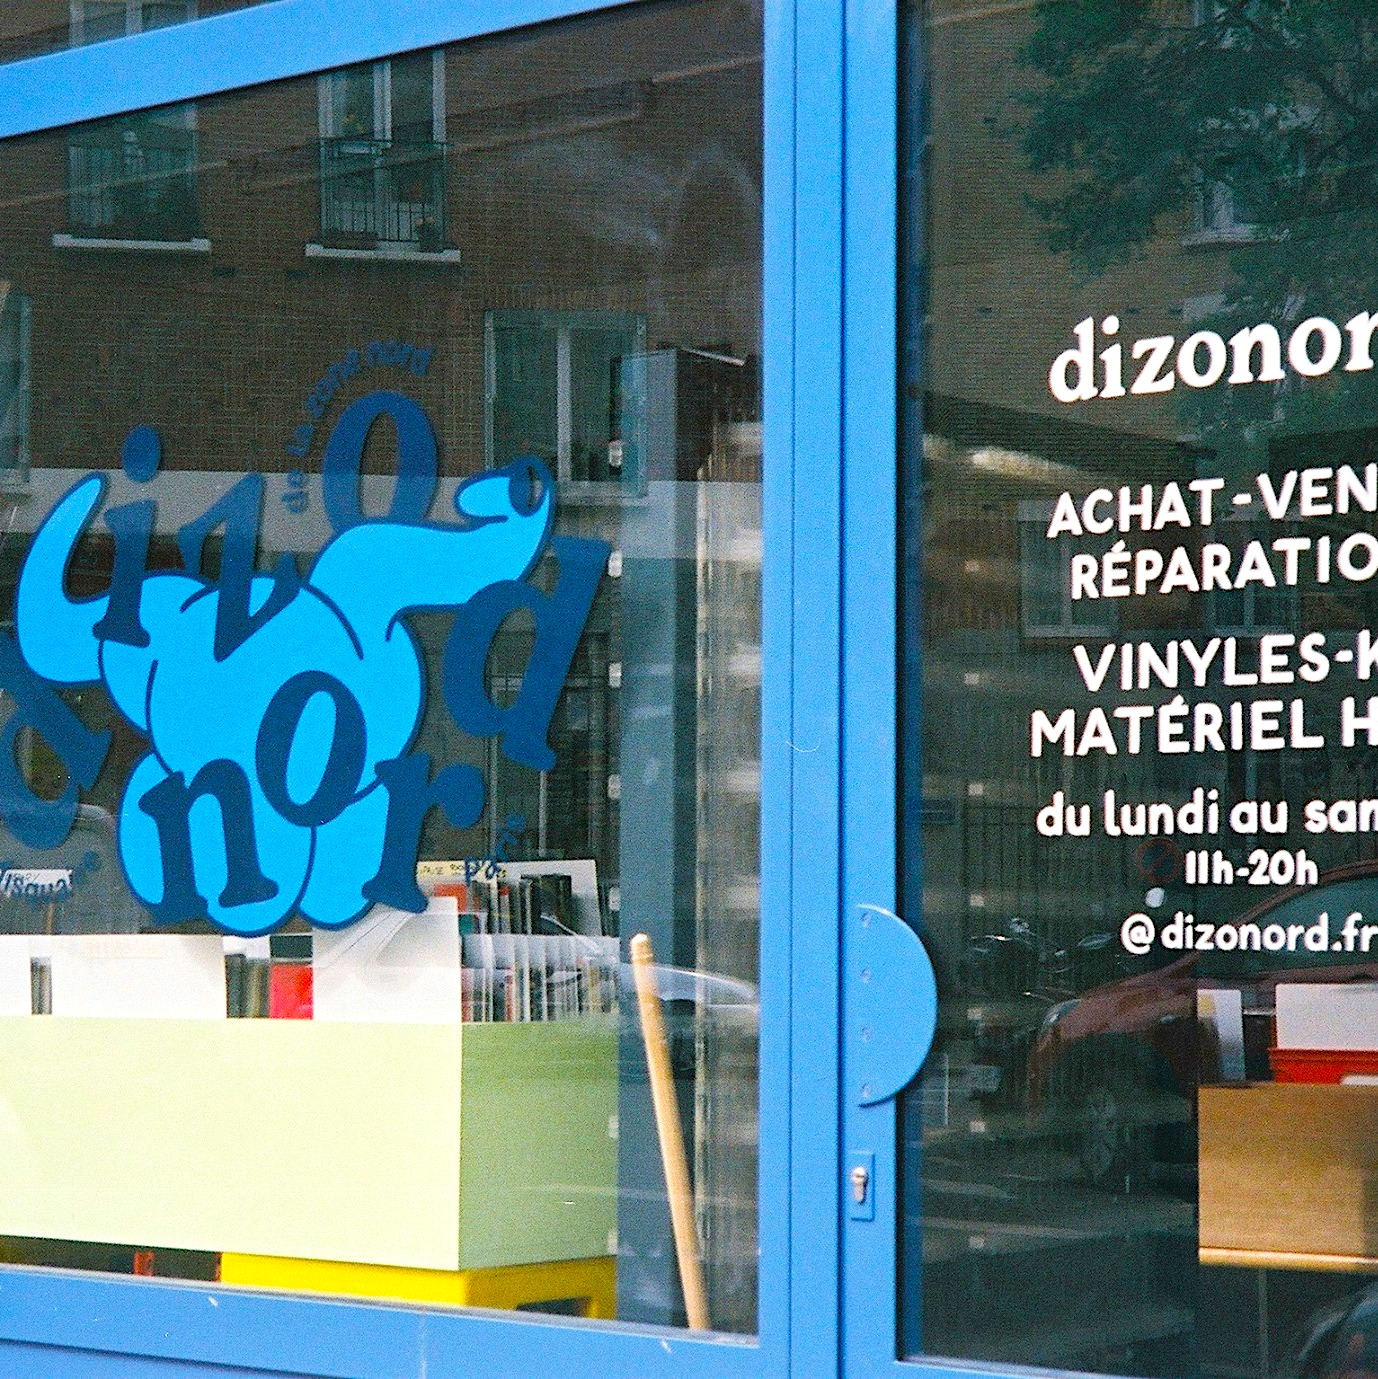 Dizonord, Paris